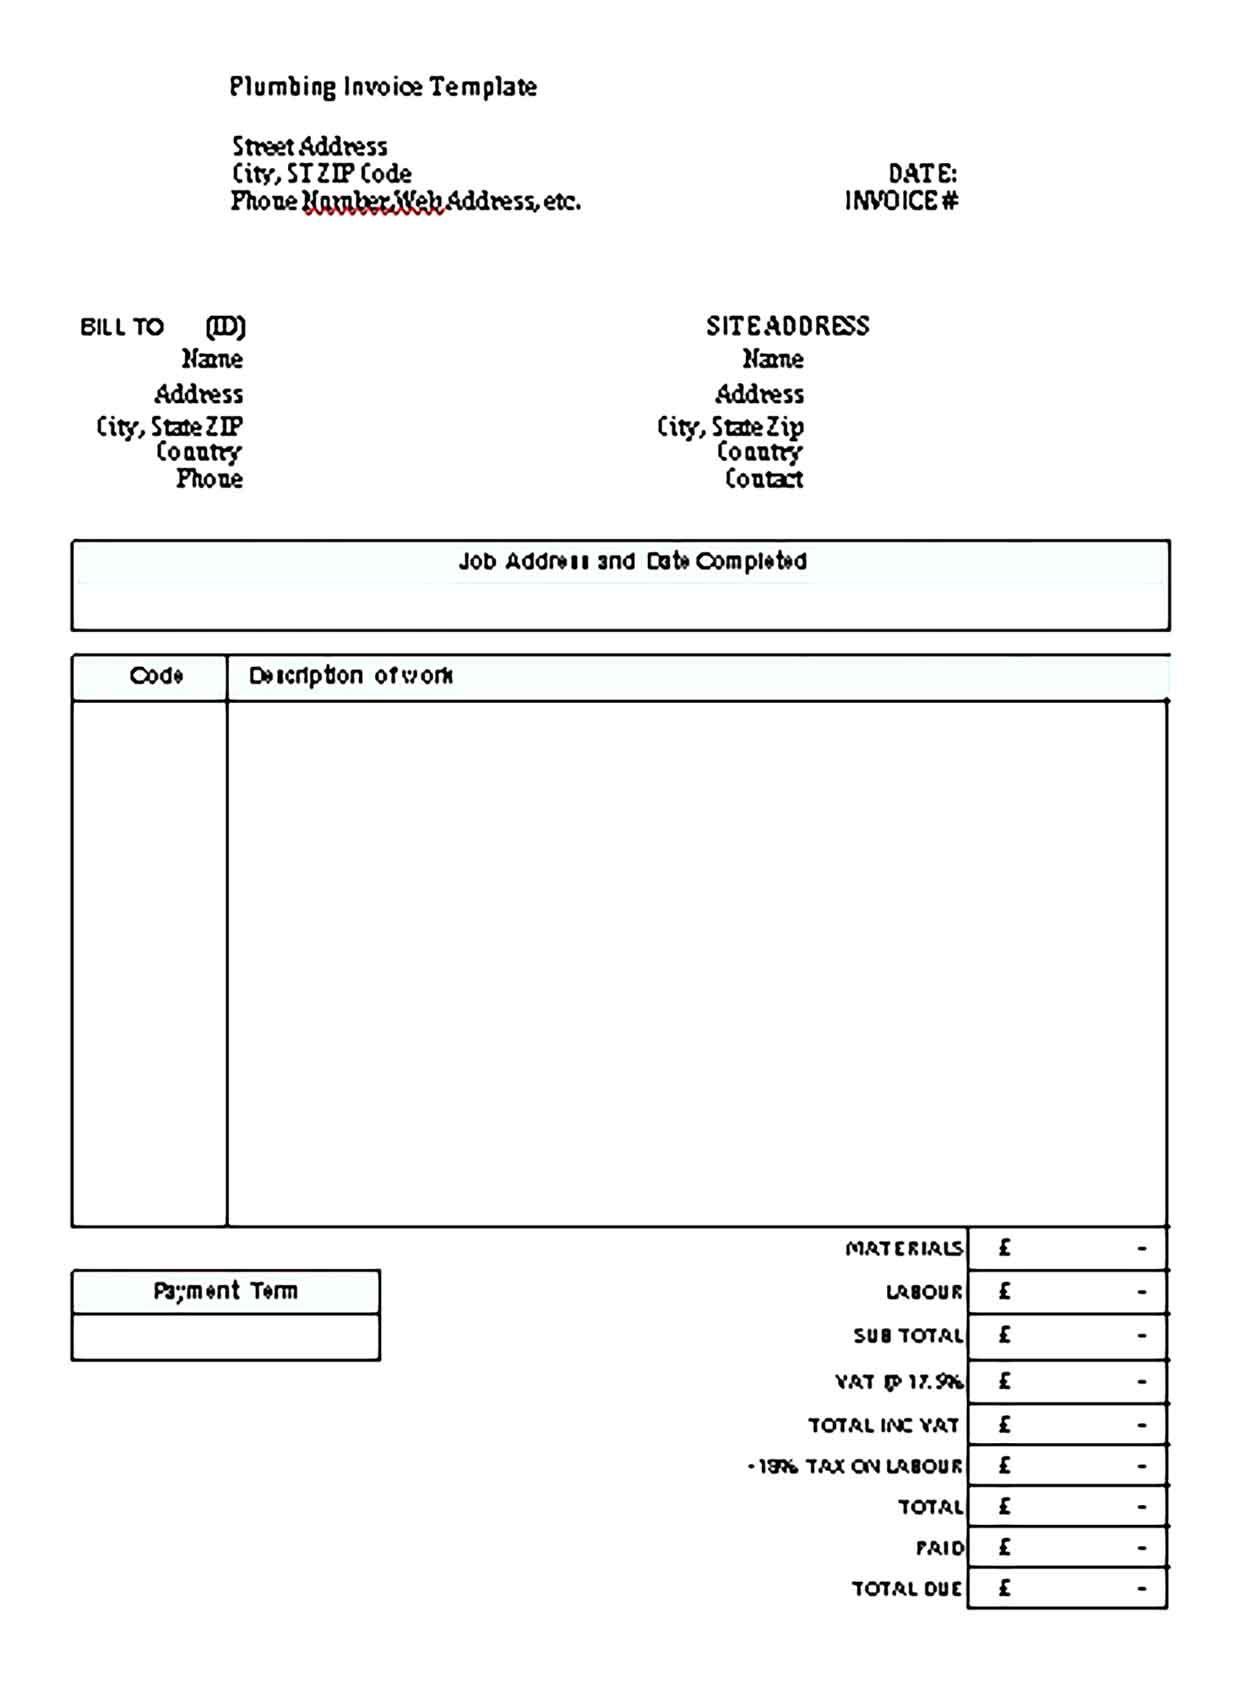 Printable Plumbing Invoice Template Invoice Template Invoice Template Word Business Template